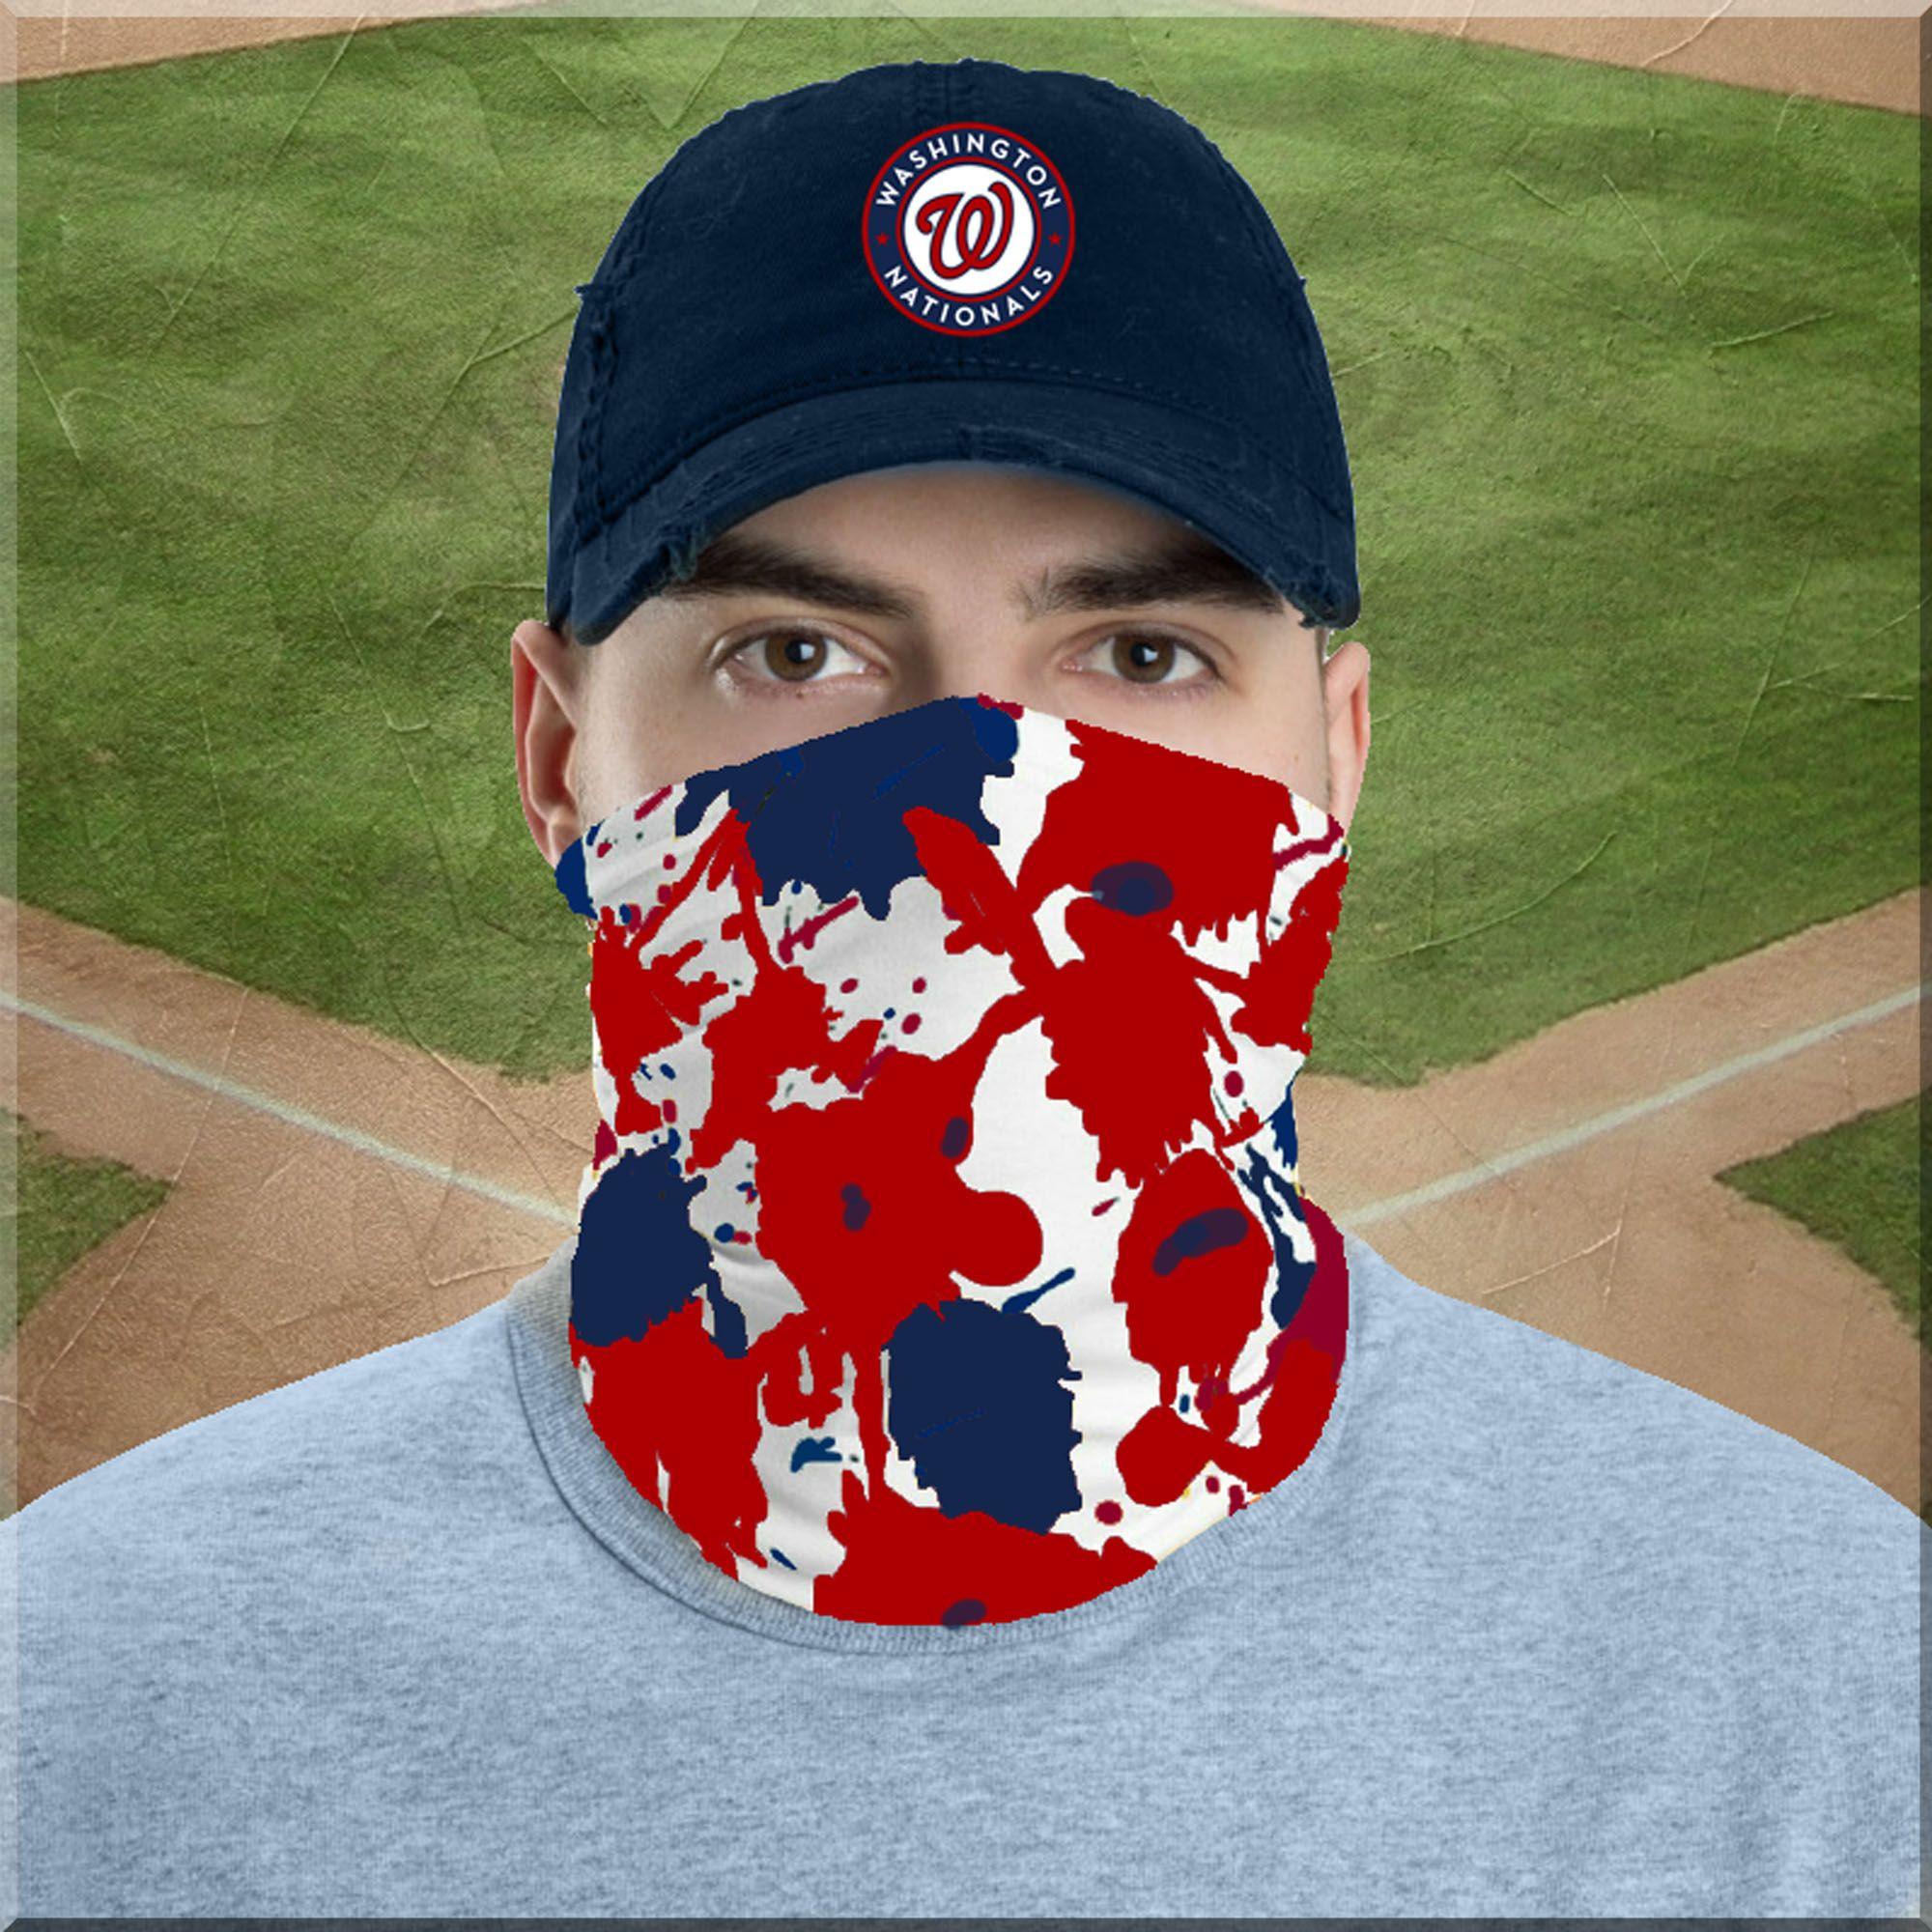 Nl East Mlbaseball Phillies Mets Marlins Braves Nationals Neckgaiter Facecover Facemask Headband Bandana Beanie Urban Fashion In 2020 Neck Gaiter Phillies Gaiters